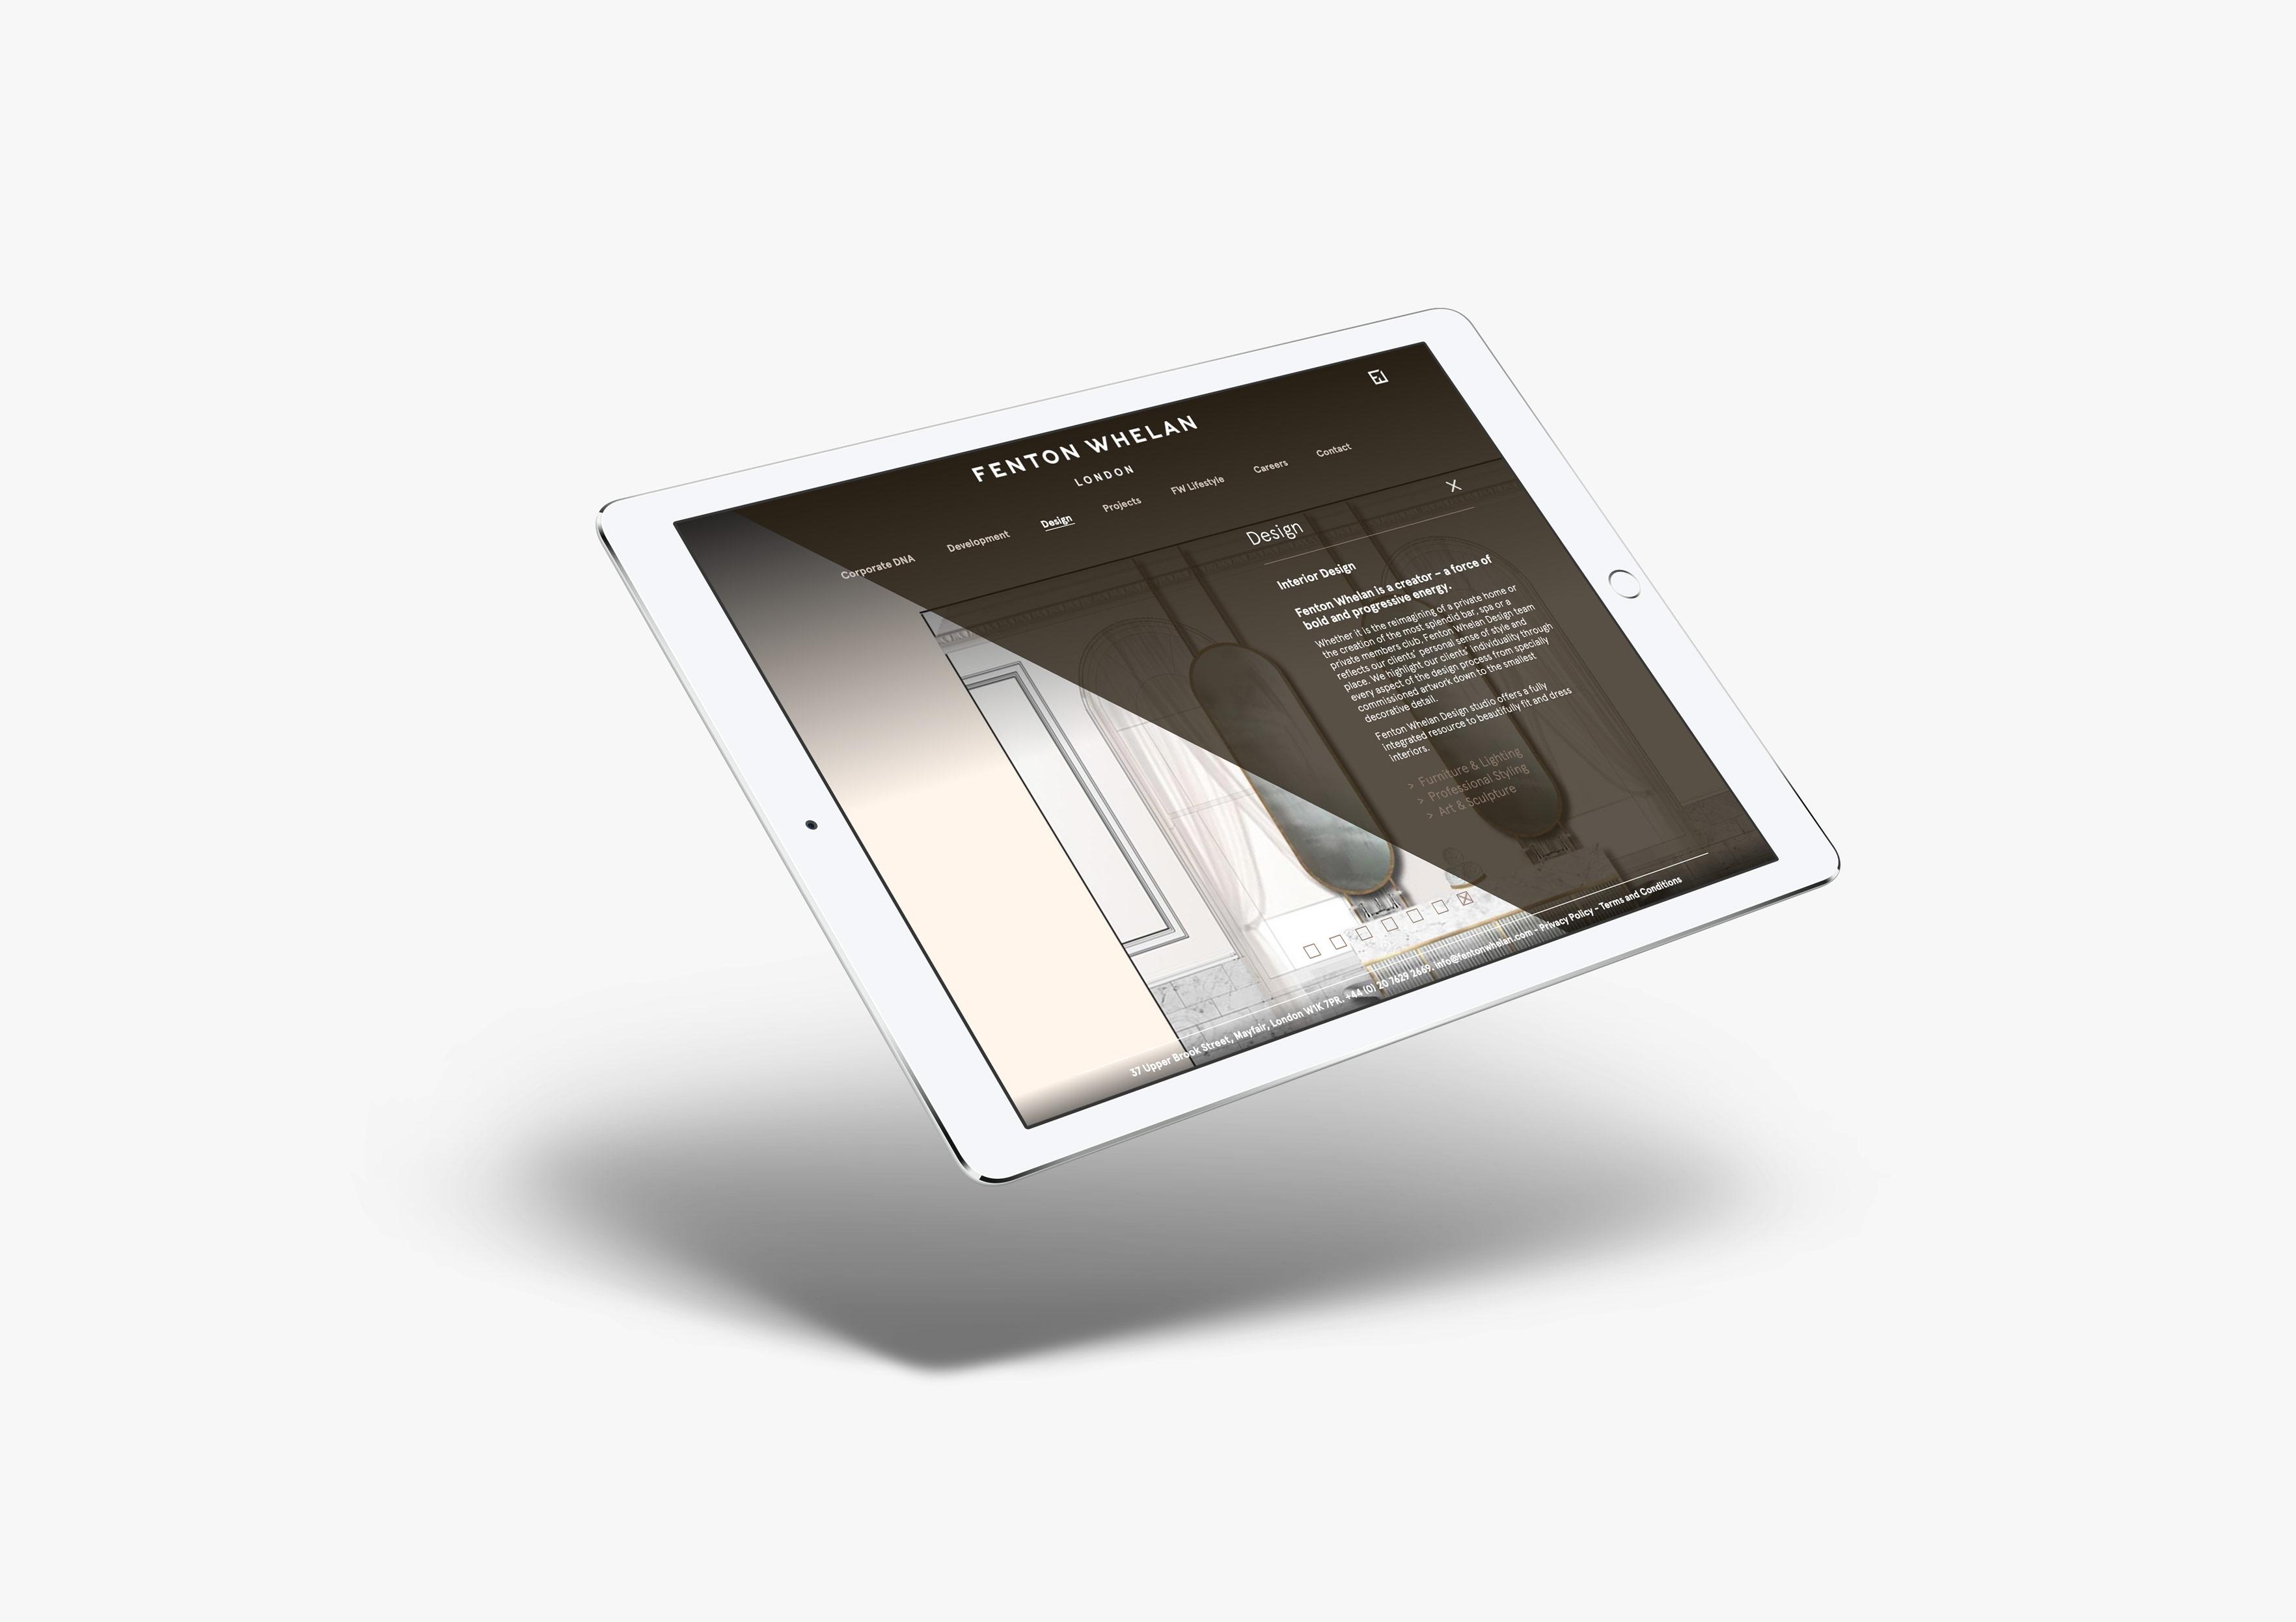 fenotn ipad website design